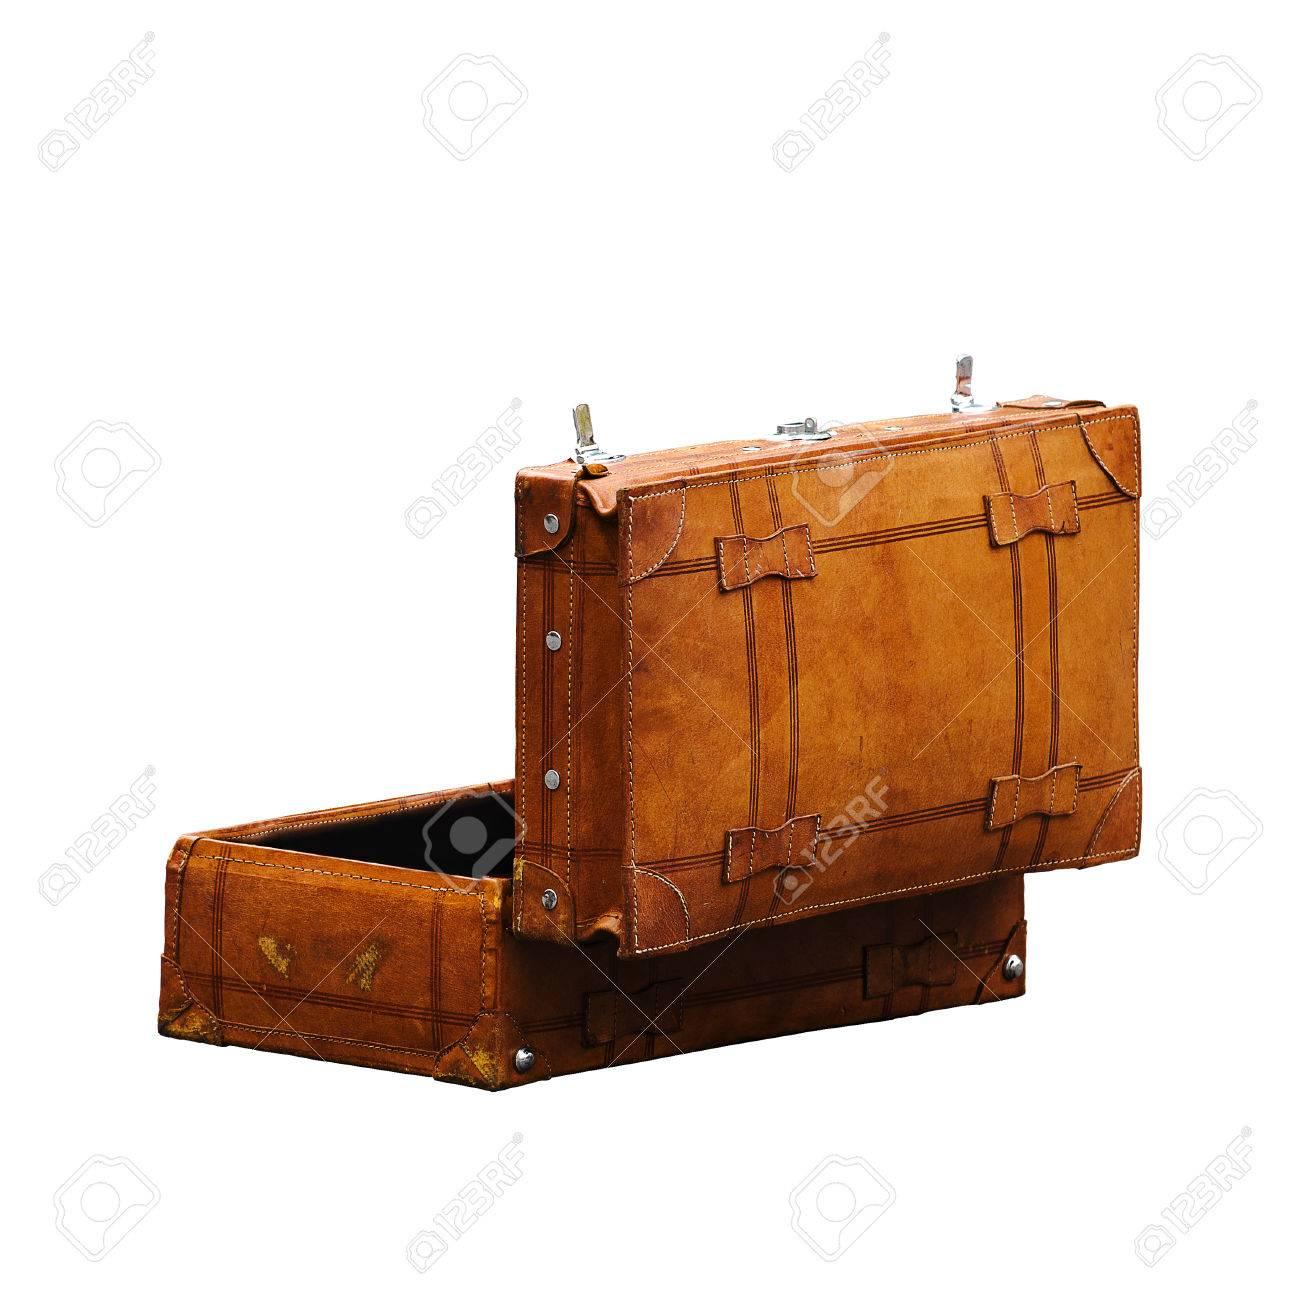 Vintage Leather Retro Luggage Suitcase Open ISolated On White